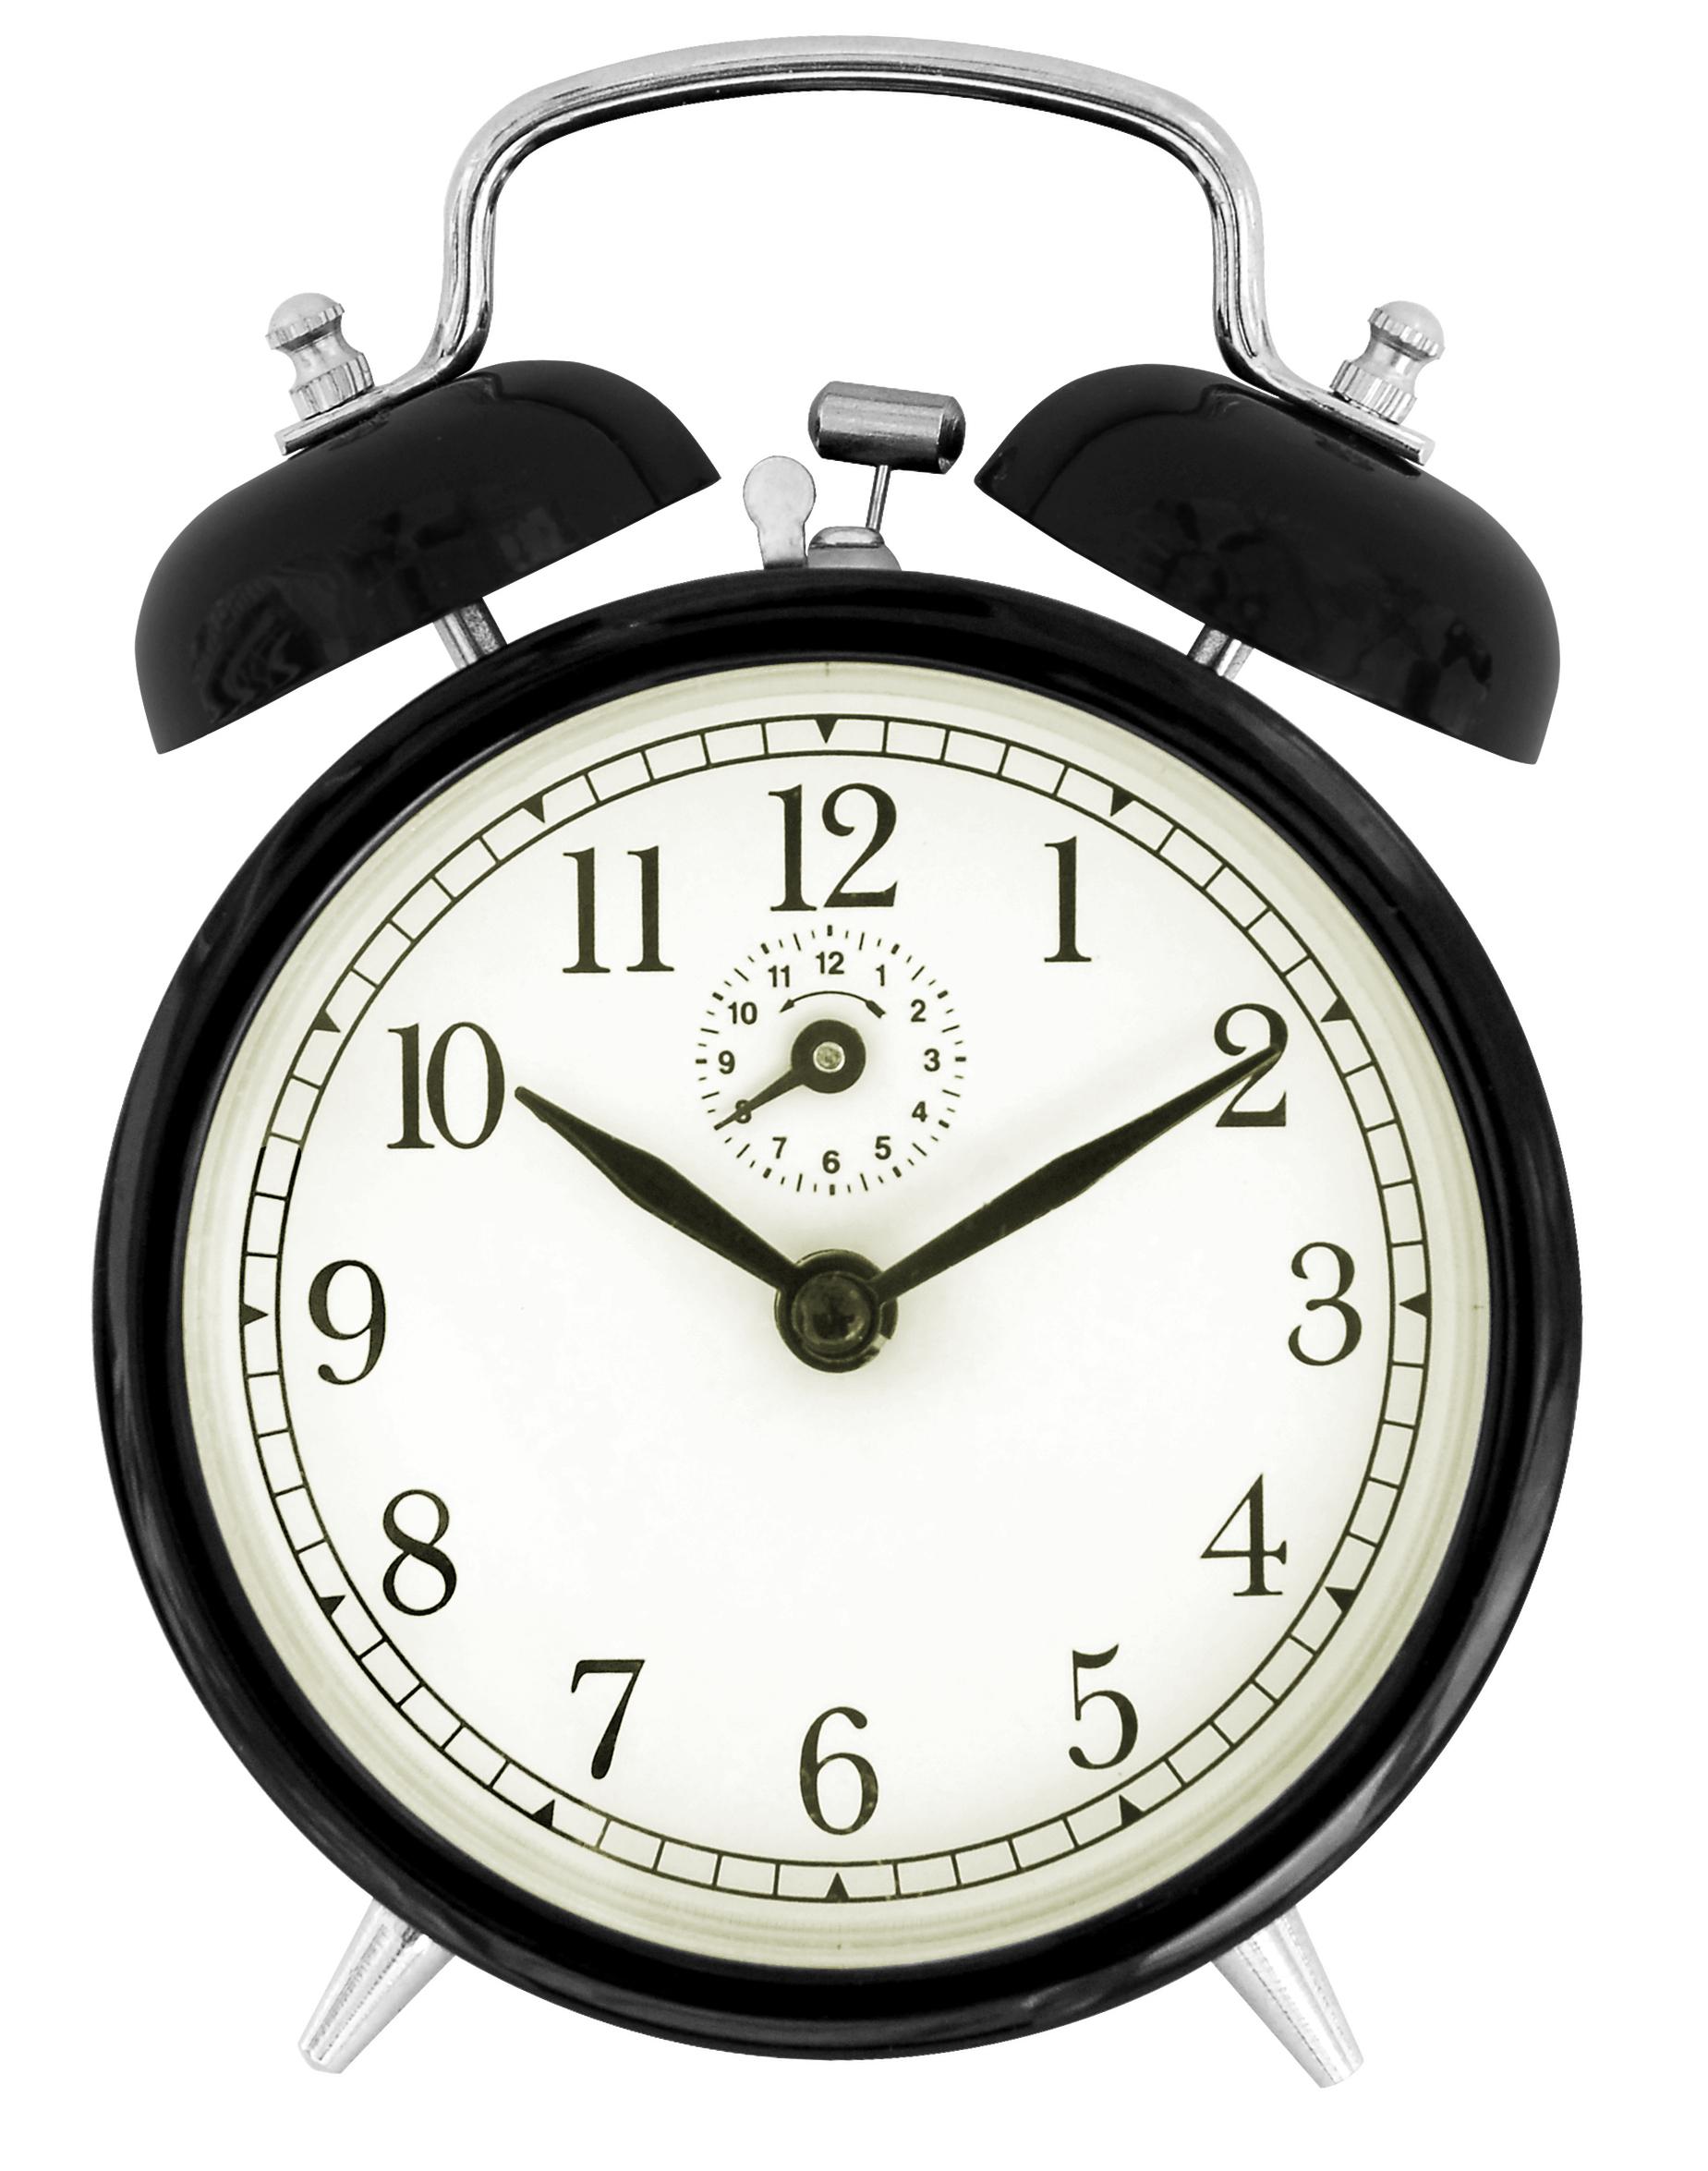 https://i1.wp.com/upload.wikimedia.org/wikipedia/commons/8/8b/2010-07-20_Black_windup_alarm_clock_face.jpg